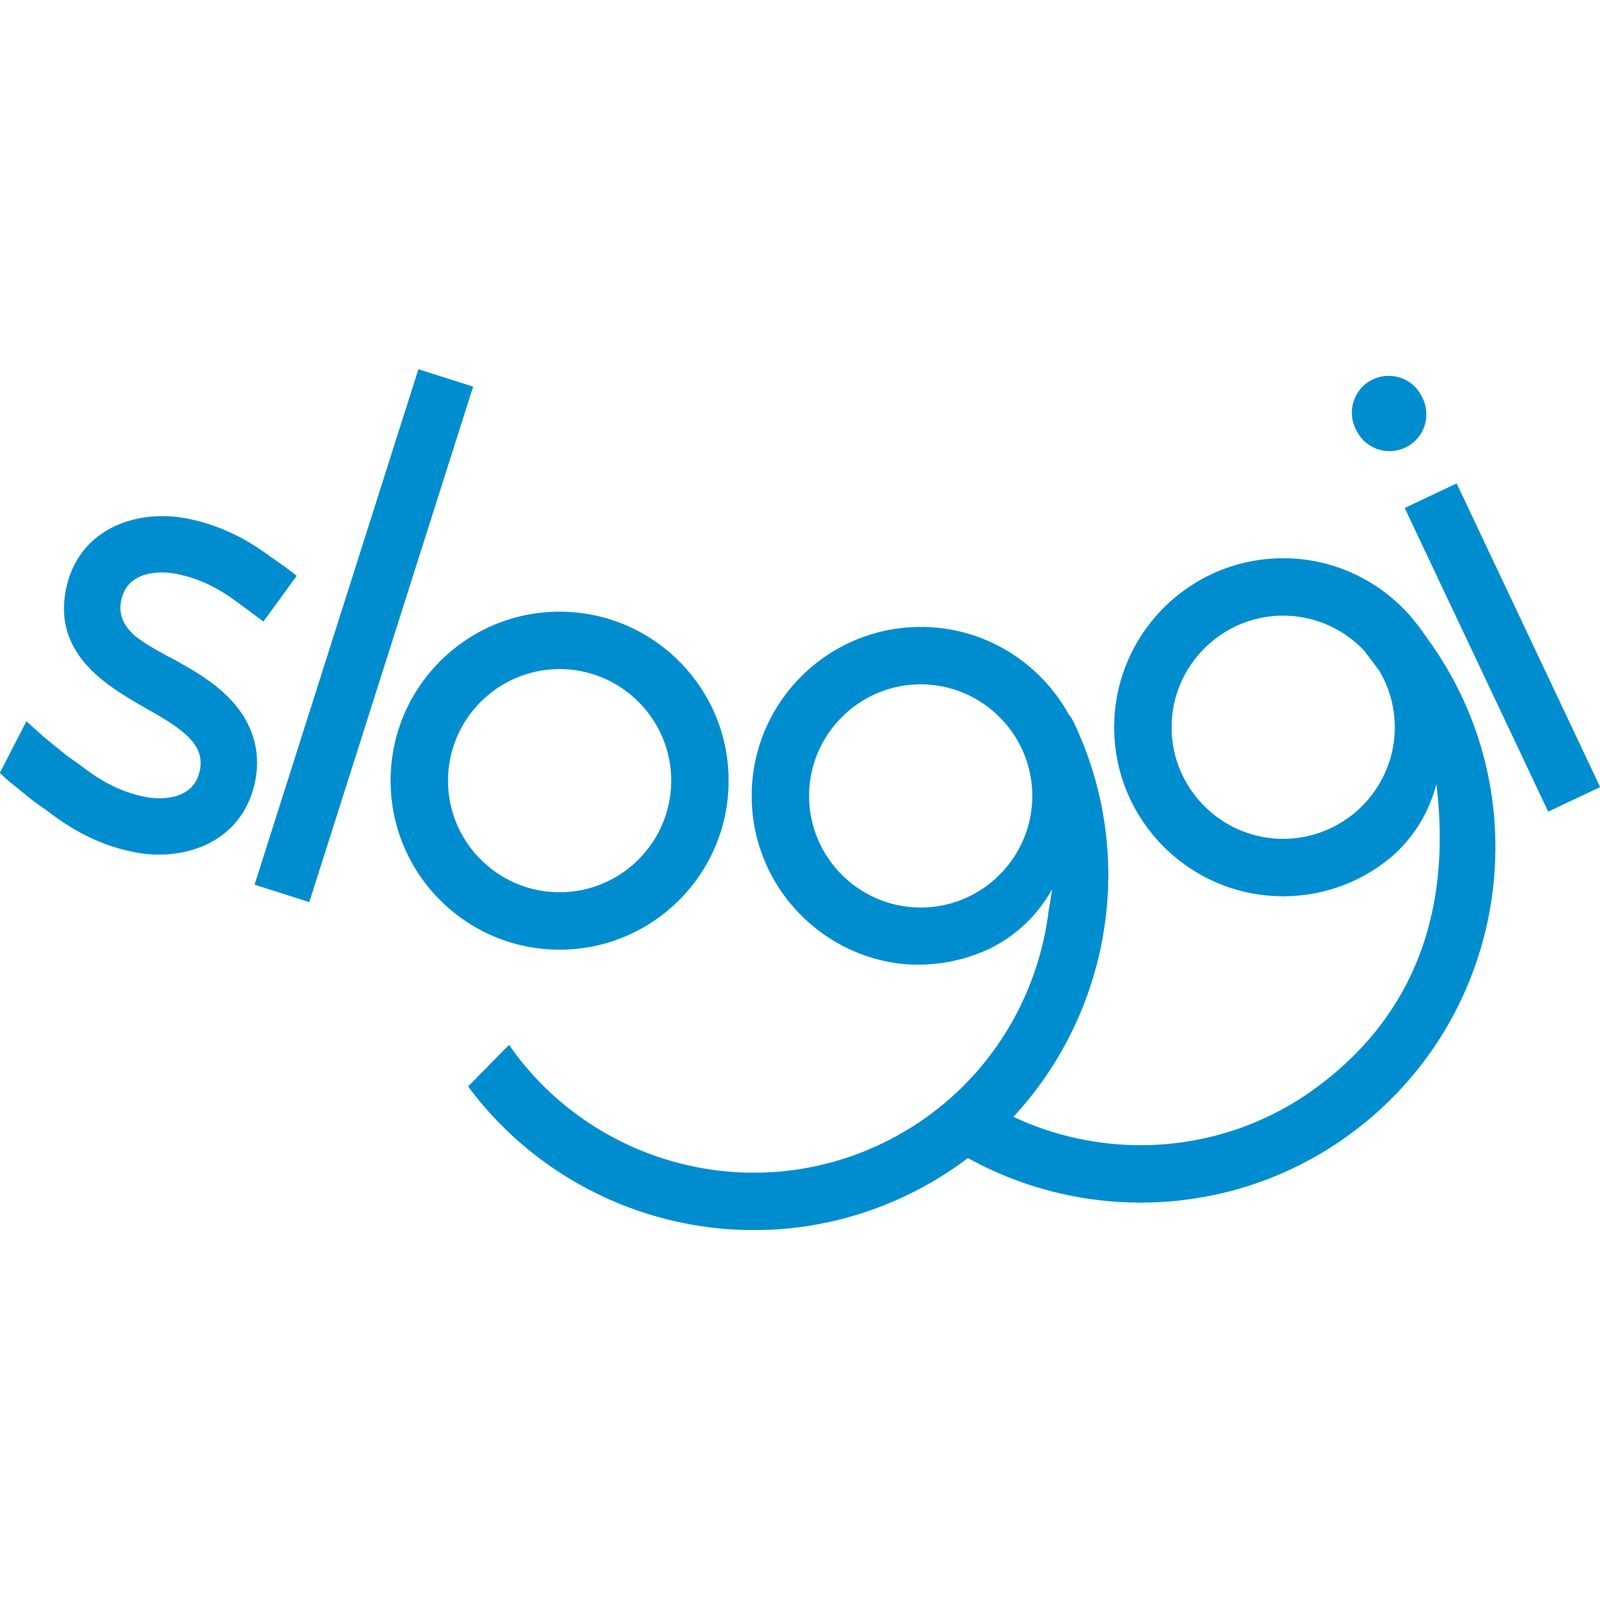 Sloggi® (Image 1)